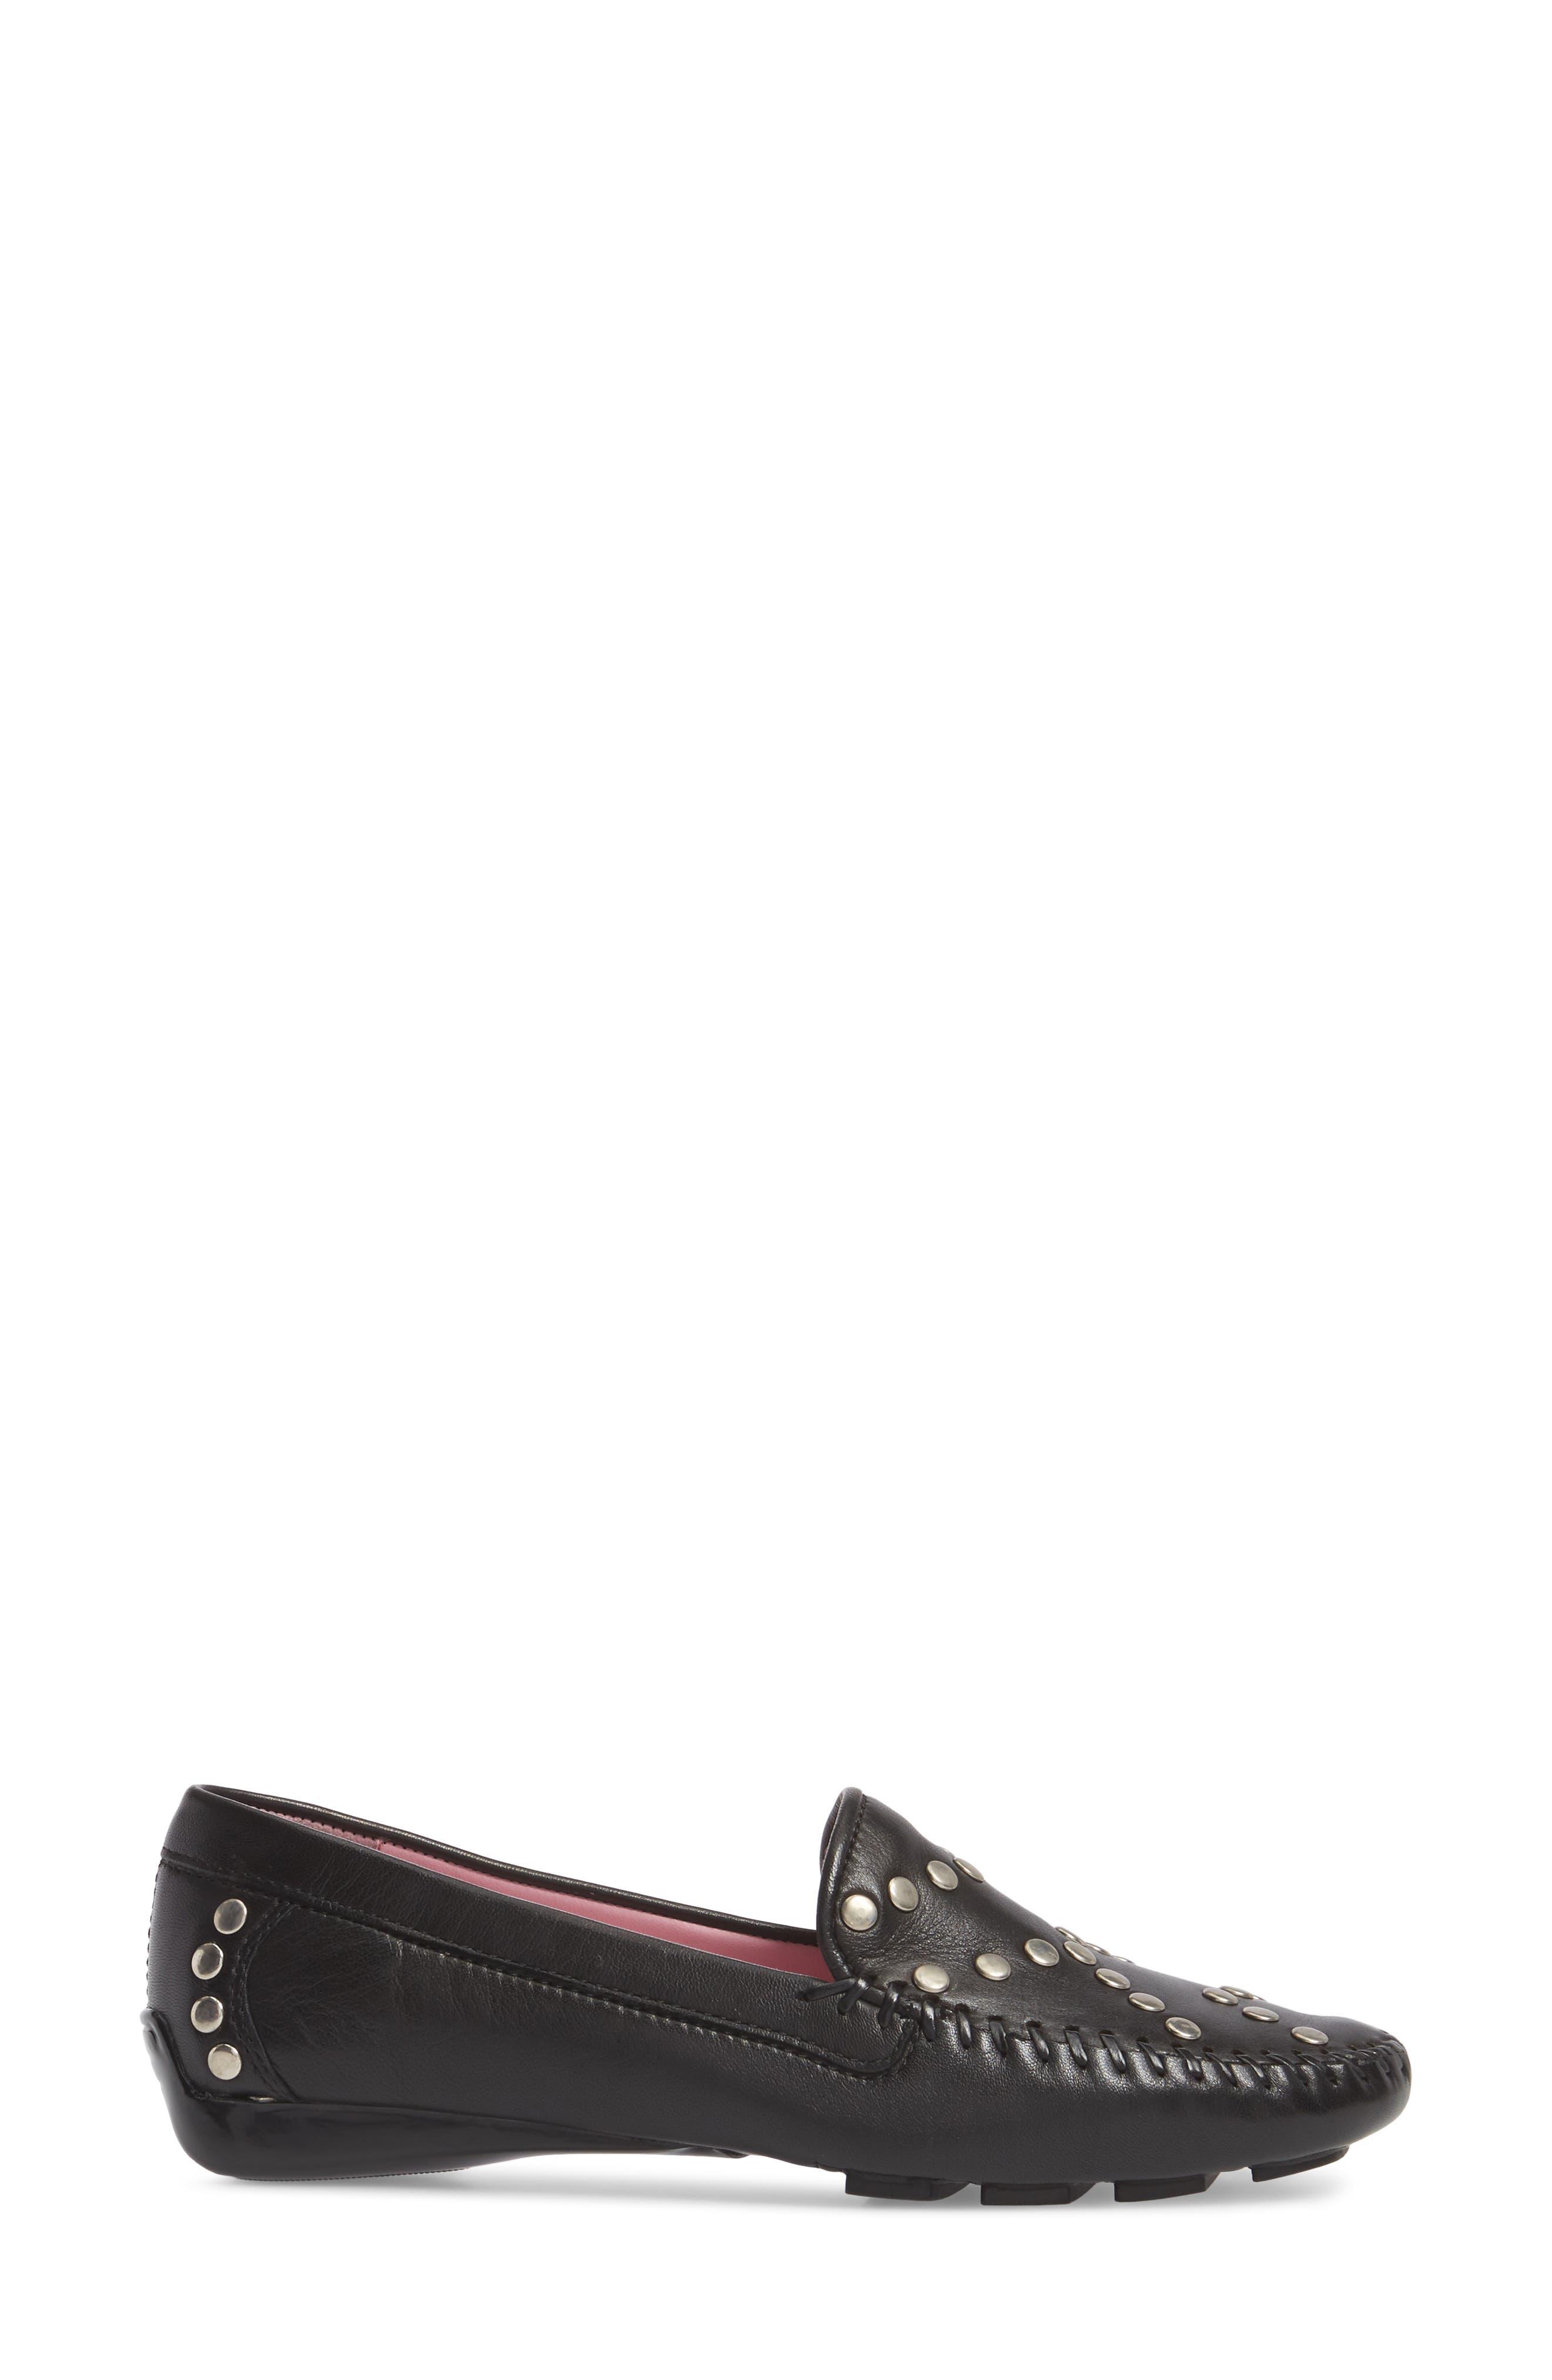 Tinae Studded Loafer,                             Alternate thumbnail 3, color,                             Black Leather